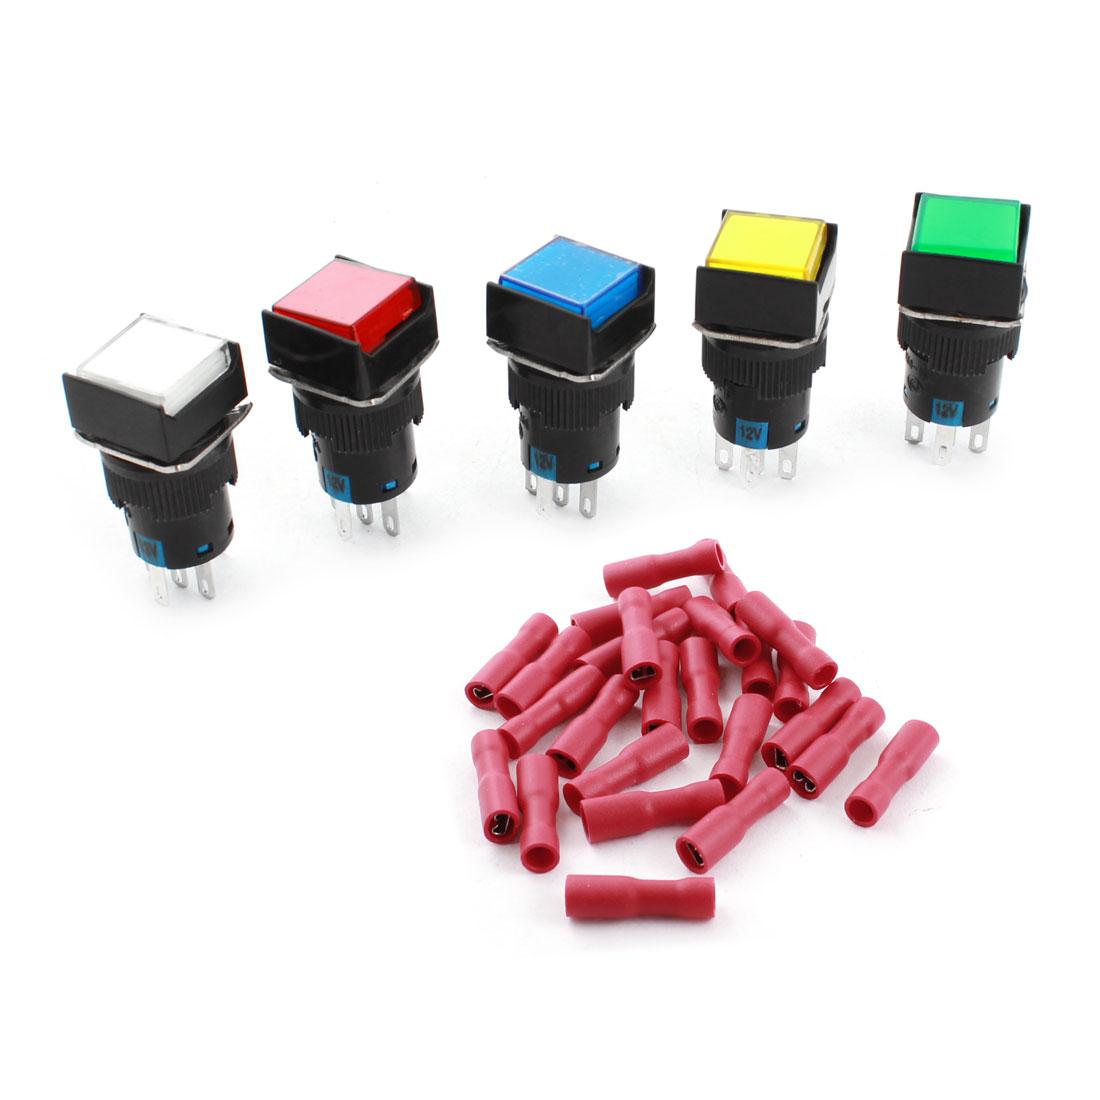 5Pcs DC 12V Pilot Light Lamp 5Pins 16mm Threaded Panel Mount SPDT Non Locking Square Push Button Switch + 25pcs Female Terminals